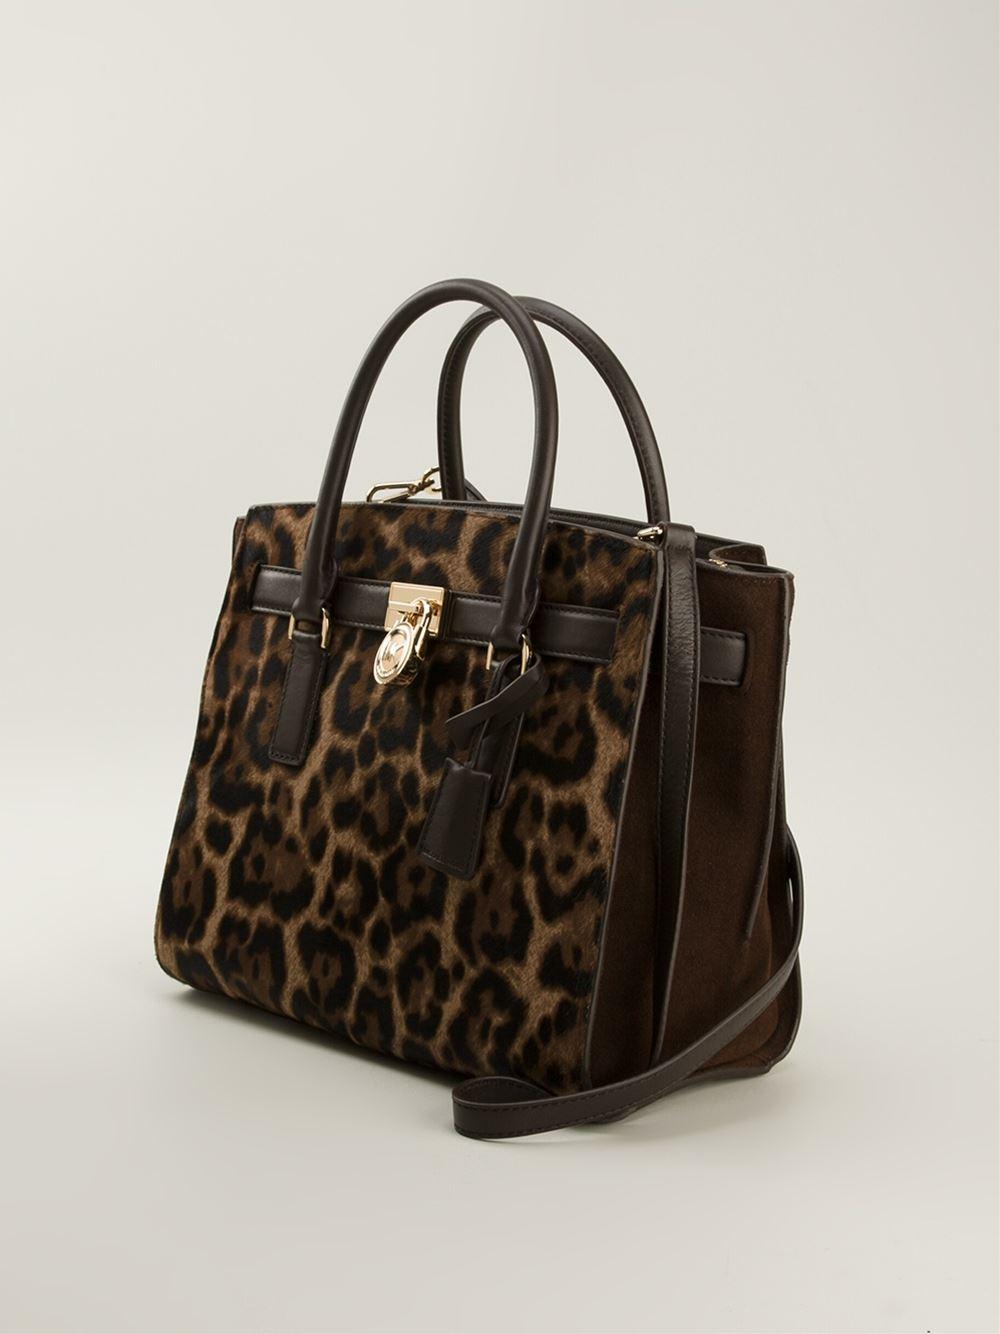 5dc514800fc9bb canada animal print michael kors purse 99888 1e3e7; promo code michael  michael kors hamilton traveler leopard print satchel in bb4ef b3bc1